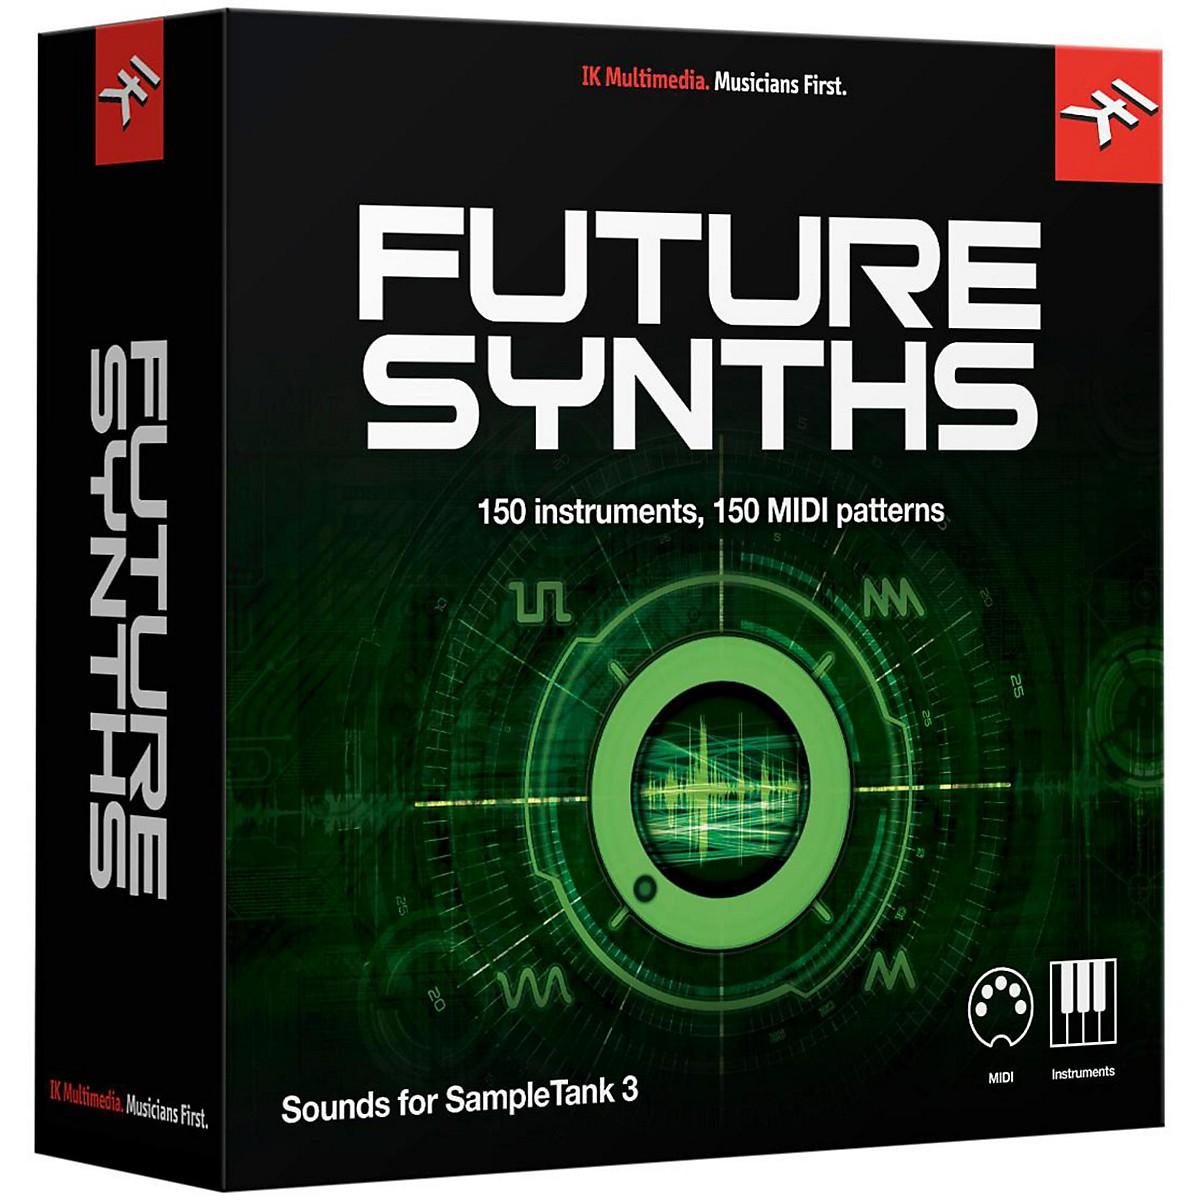 IK Multimedia SampleTank 3 Instrument Collection - Future Synths